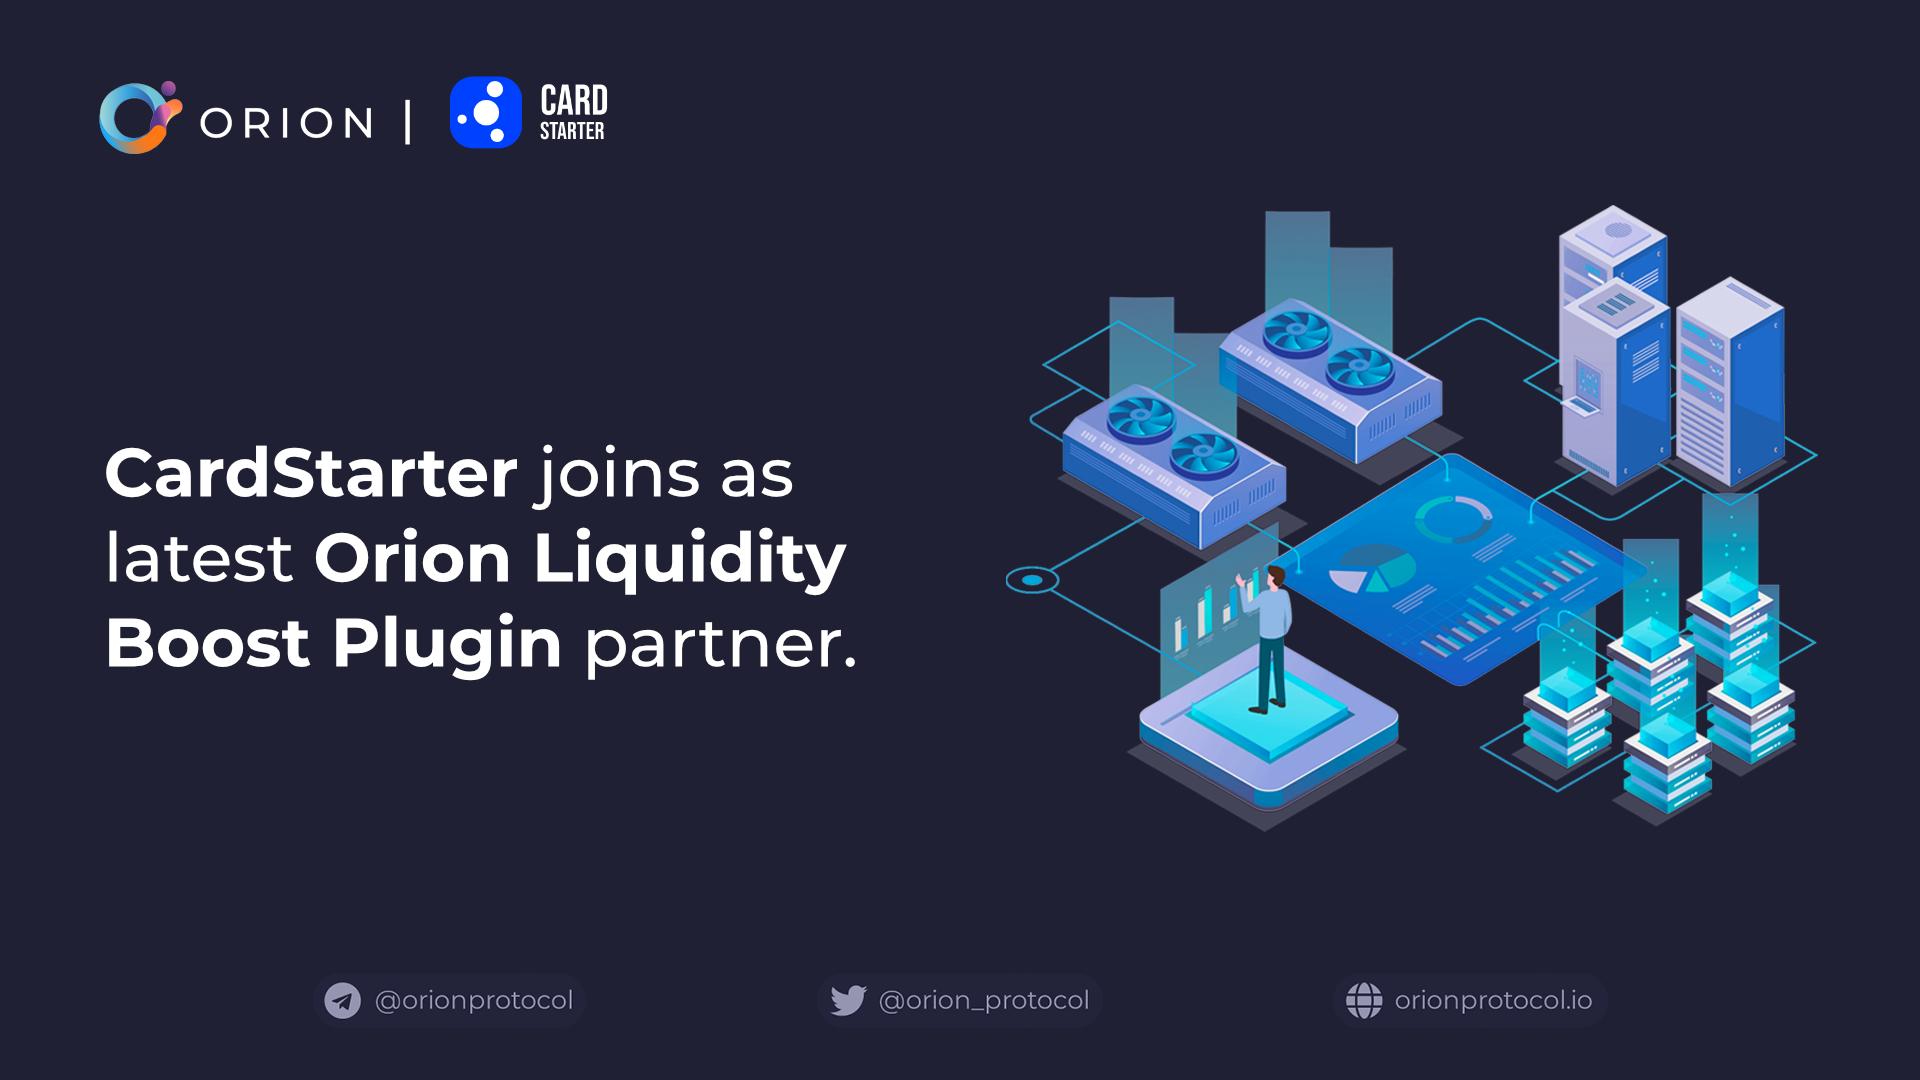 CardStarter joins as Orion Liquidity Boost Plugin partner